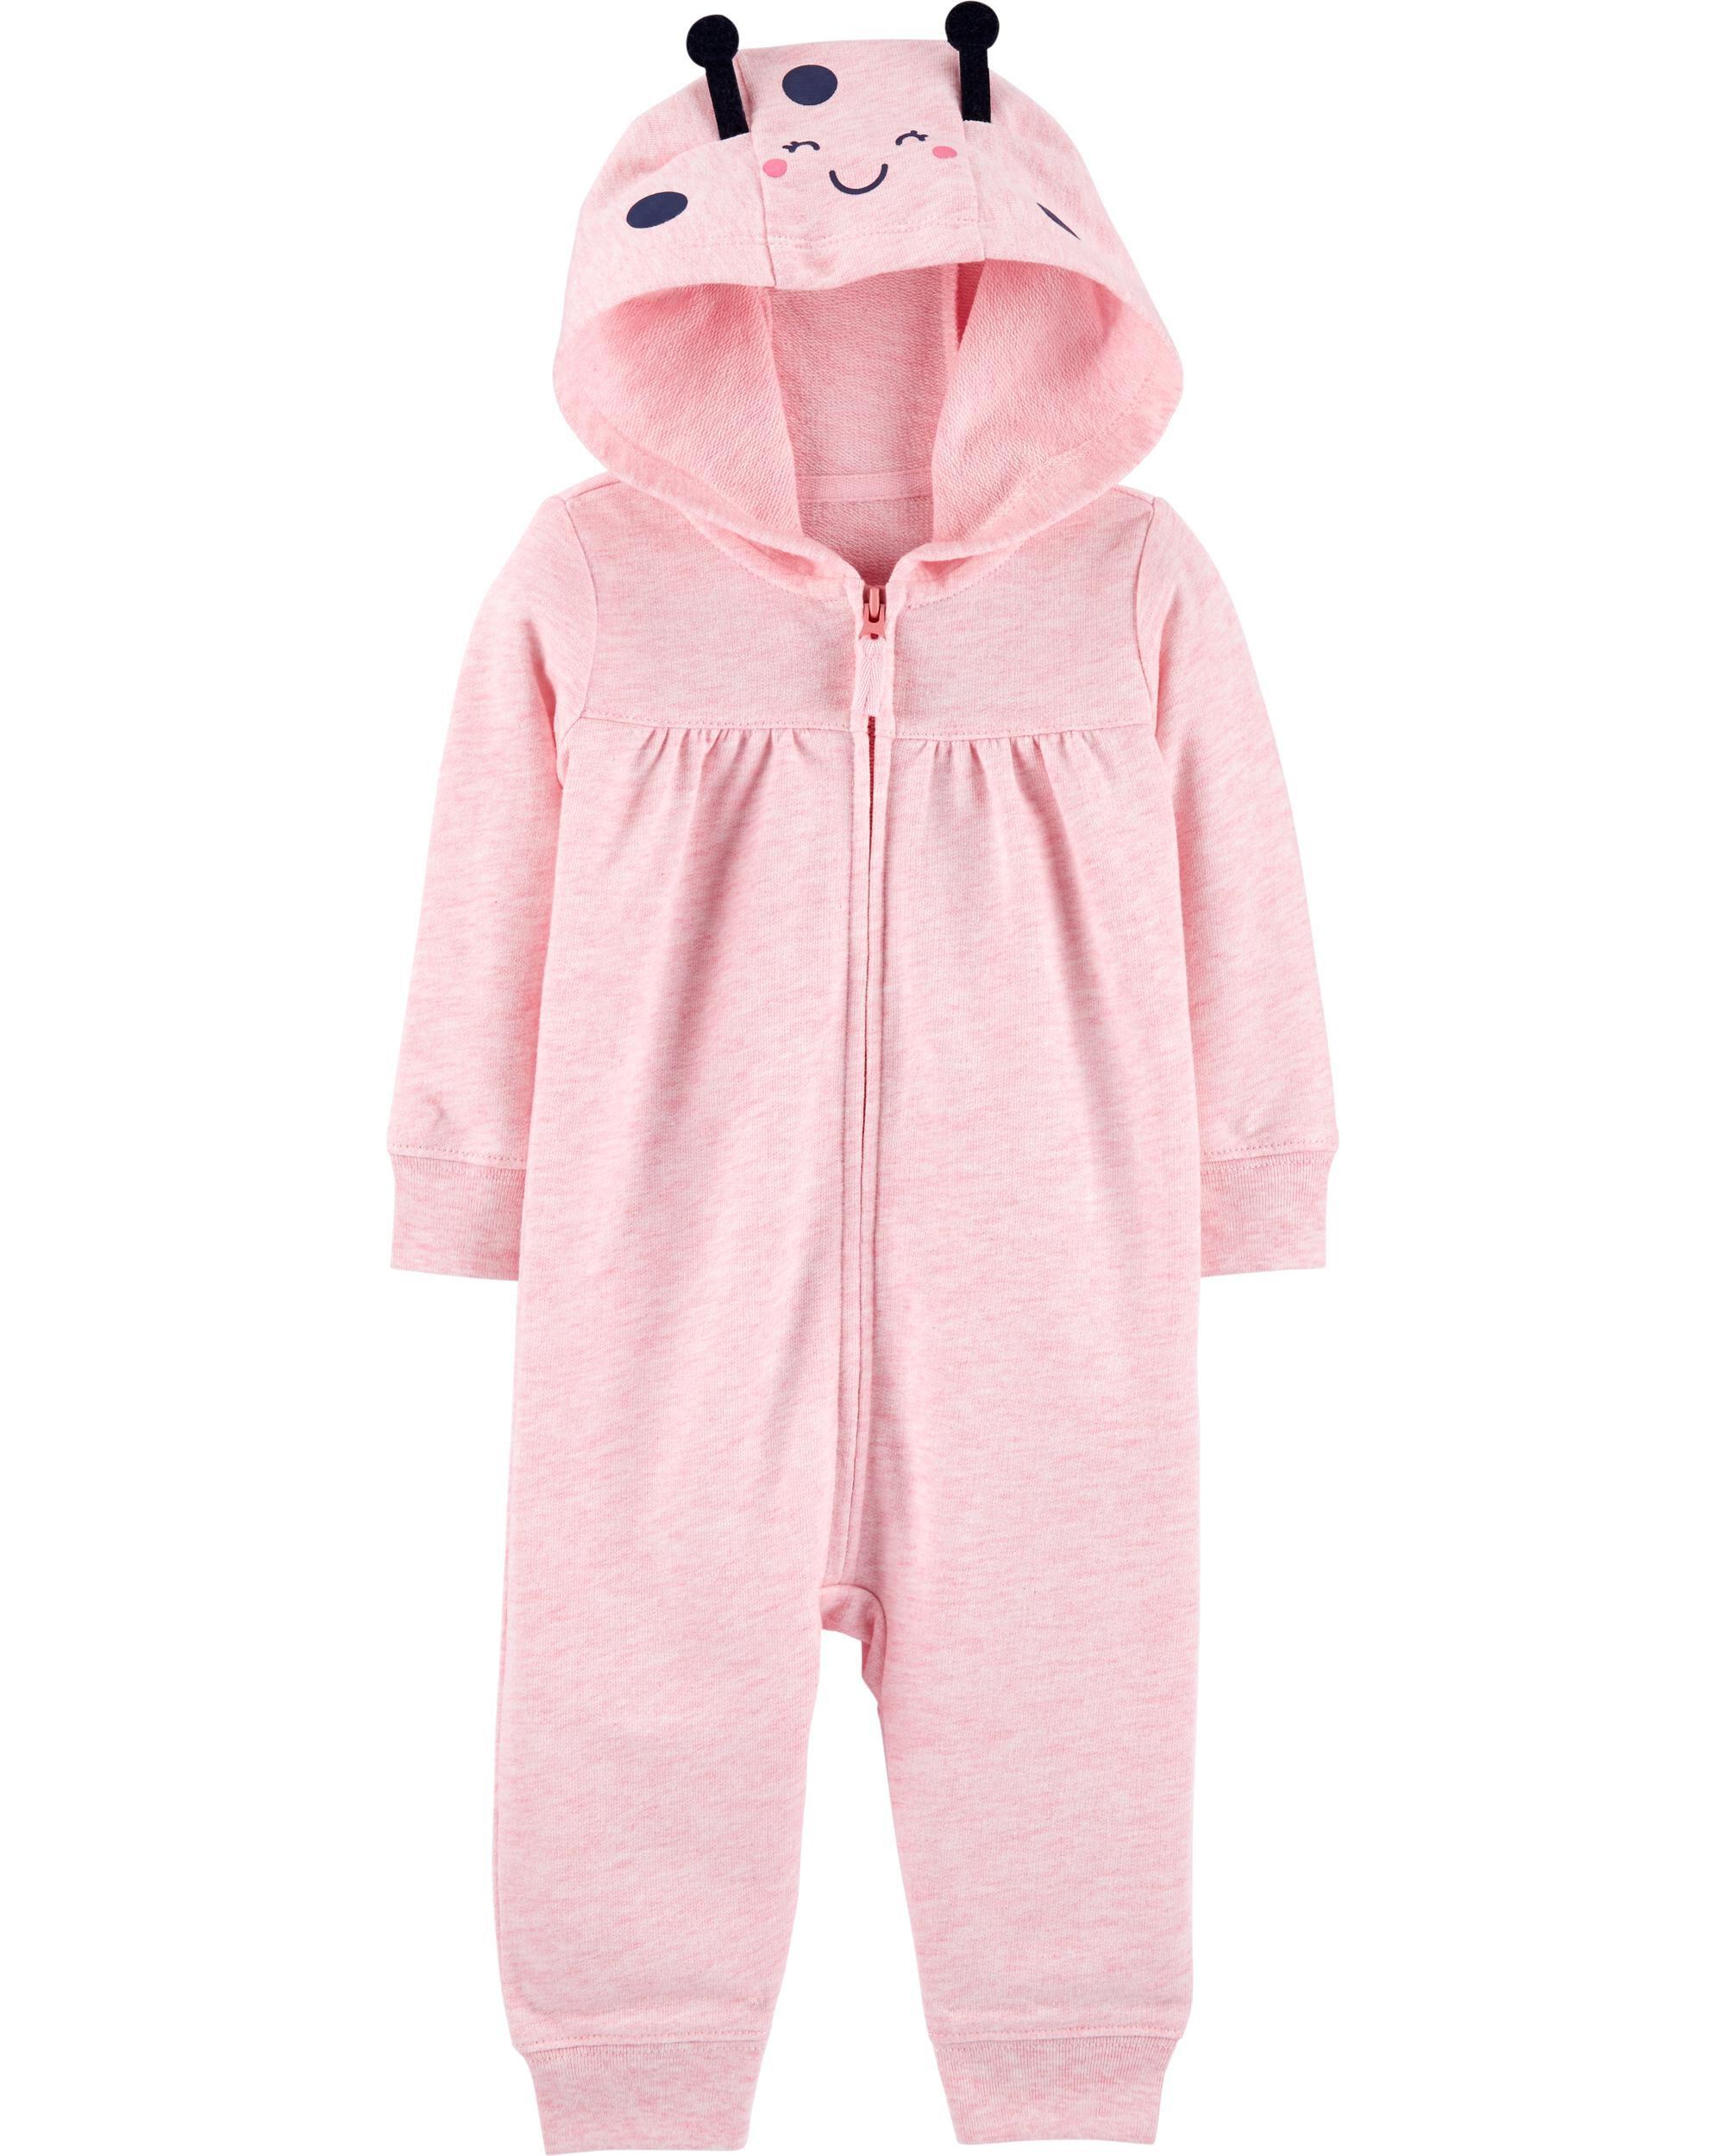 *CLEARANCE* Ladybug Hooded Zip-Up Jumpsuit